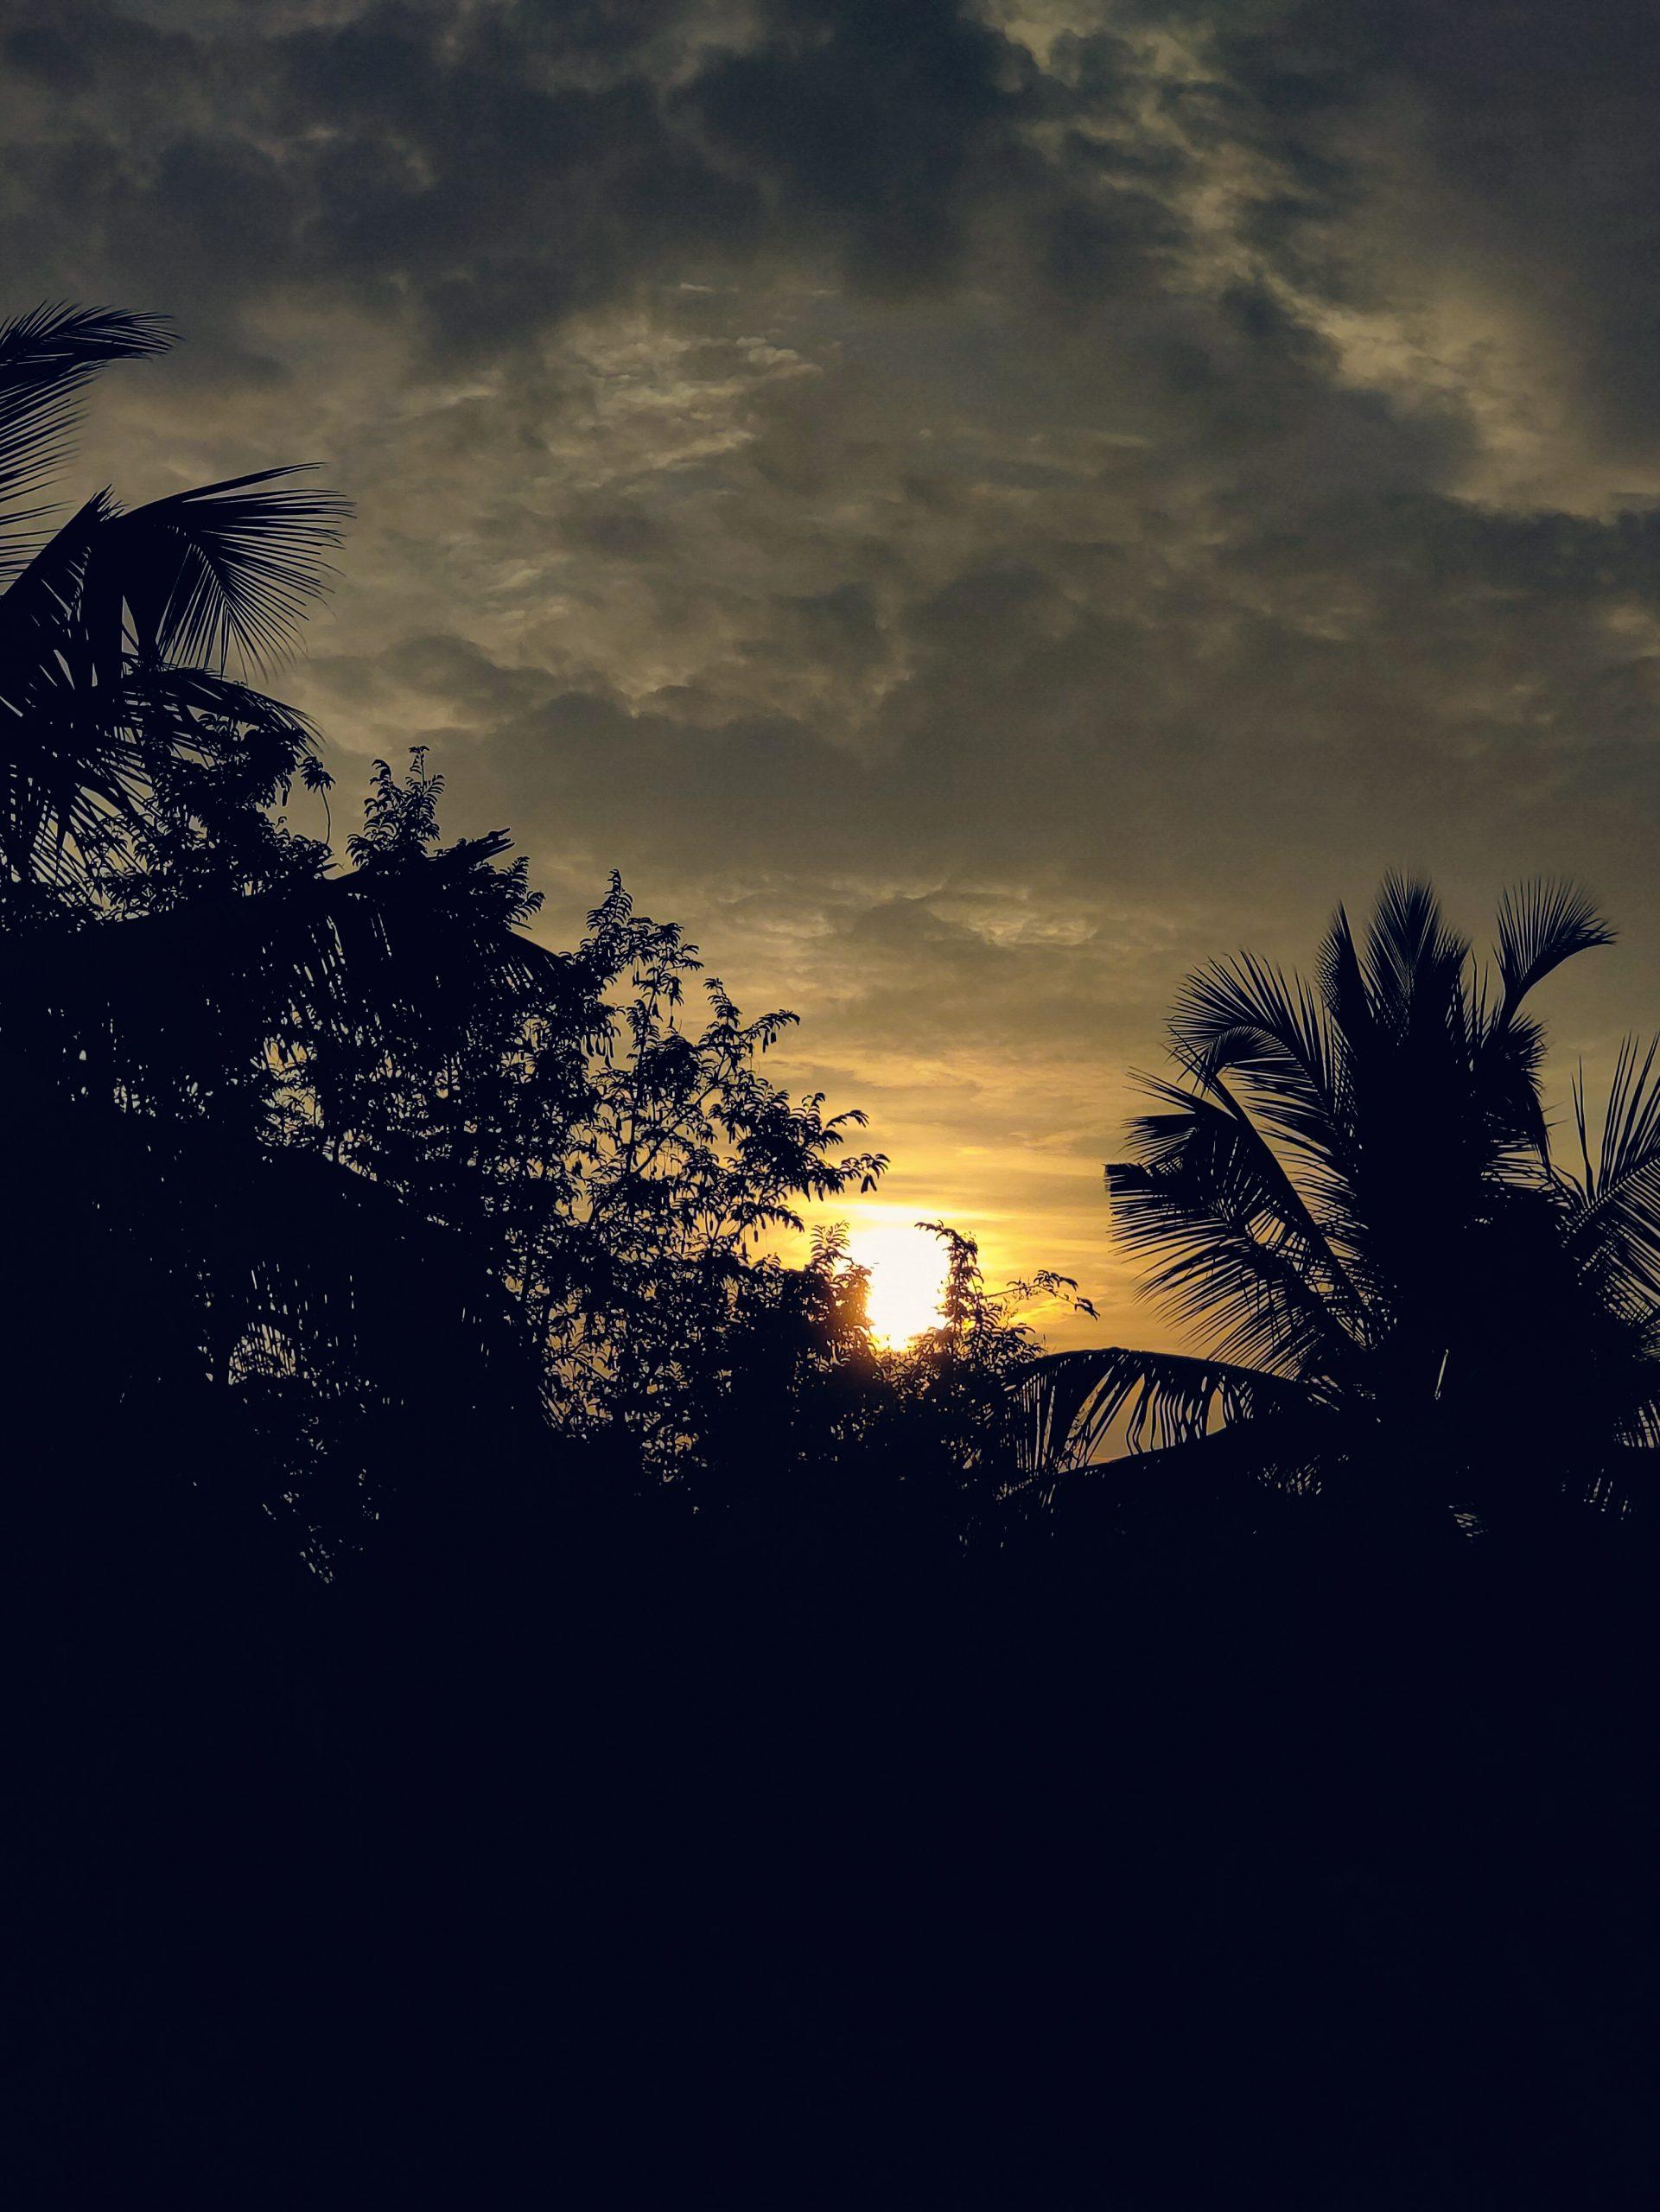 Sunset view